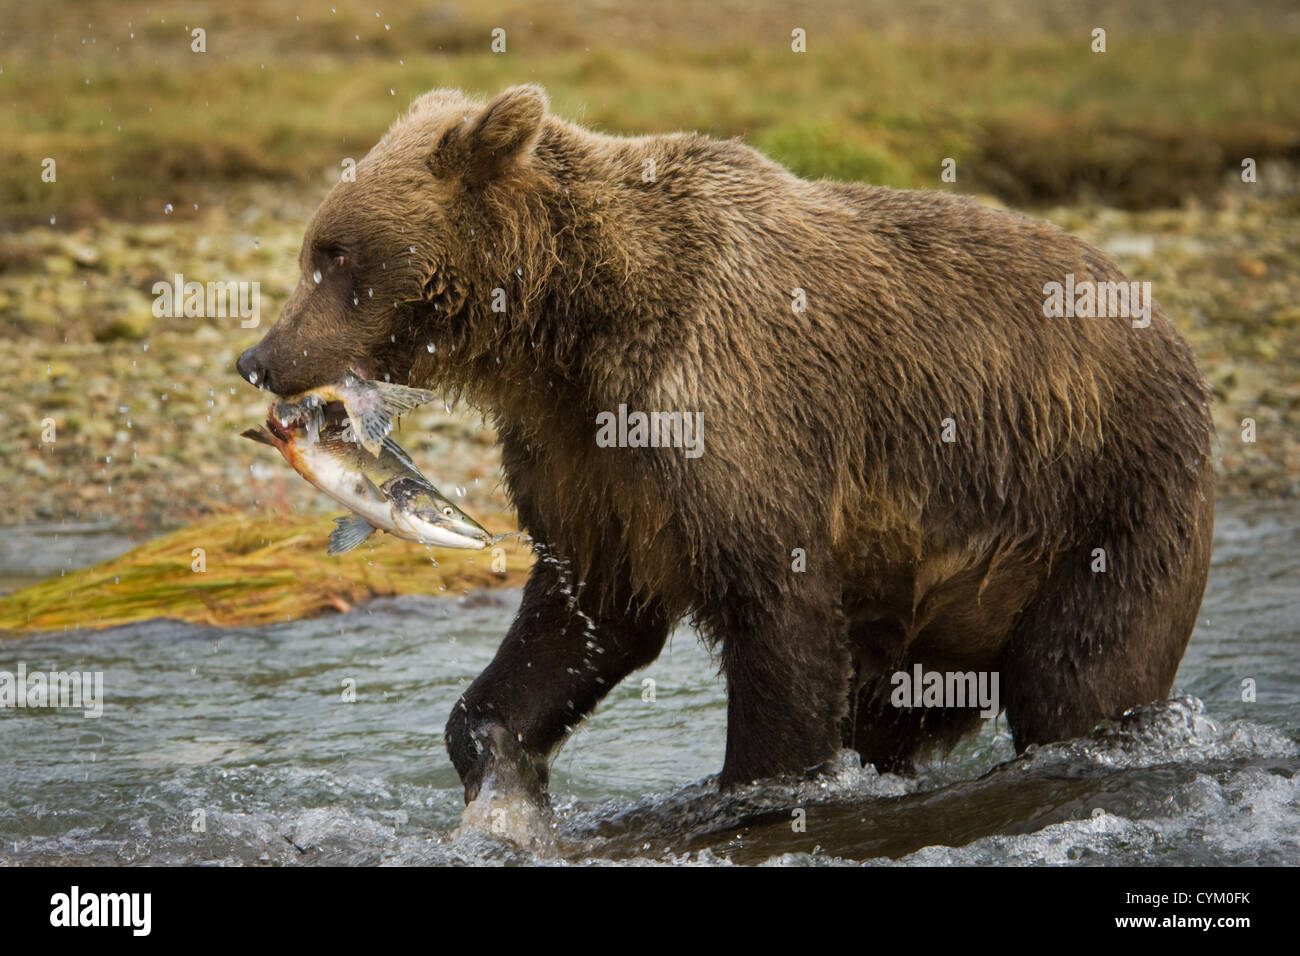 Grizzly Bear (Ursus arctos) with a caught Salmon in river, Katmai national park, Alaska, USA. - Stock Image